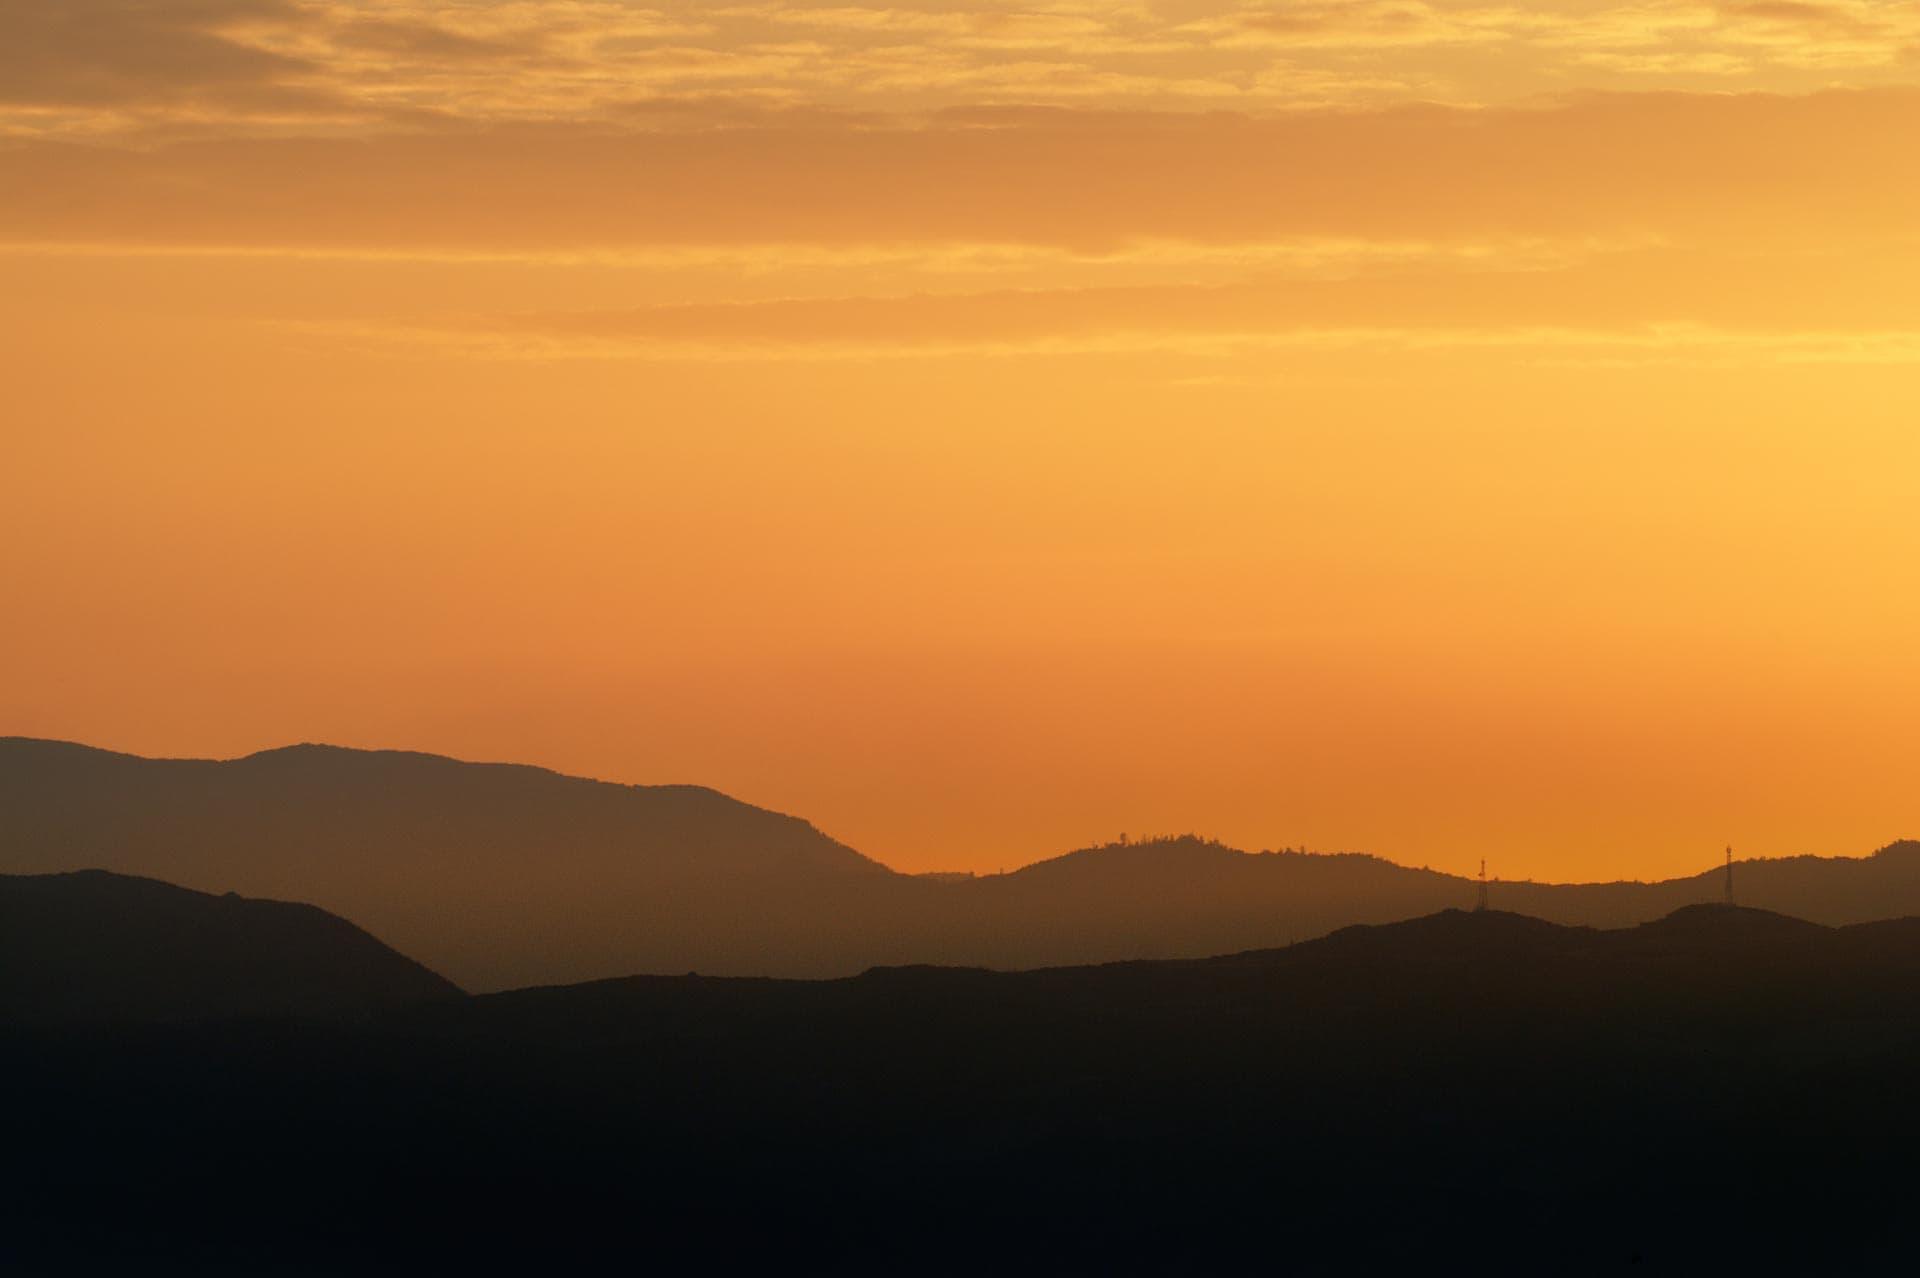 View across Lake ohrid, Macedonia to the mountains of Albania